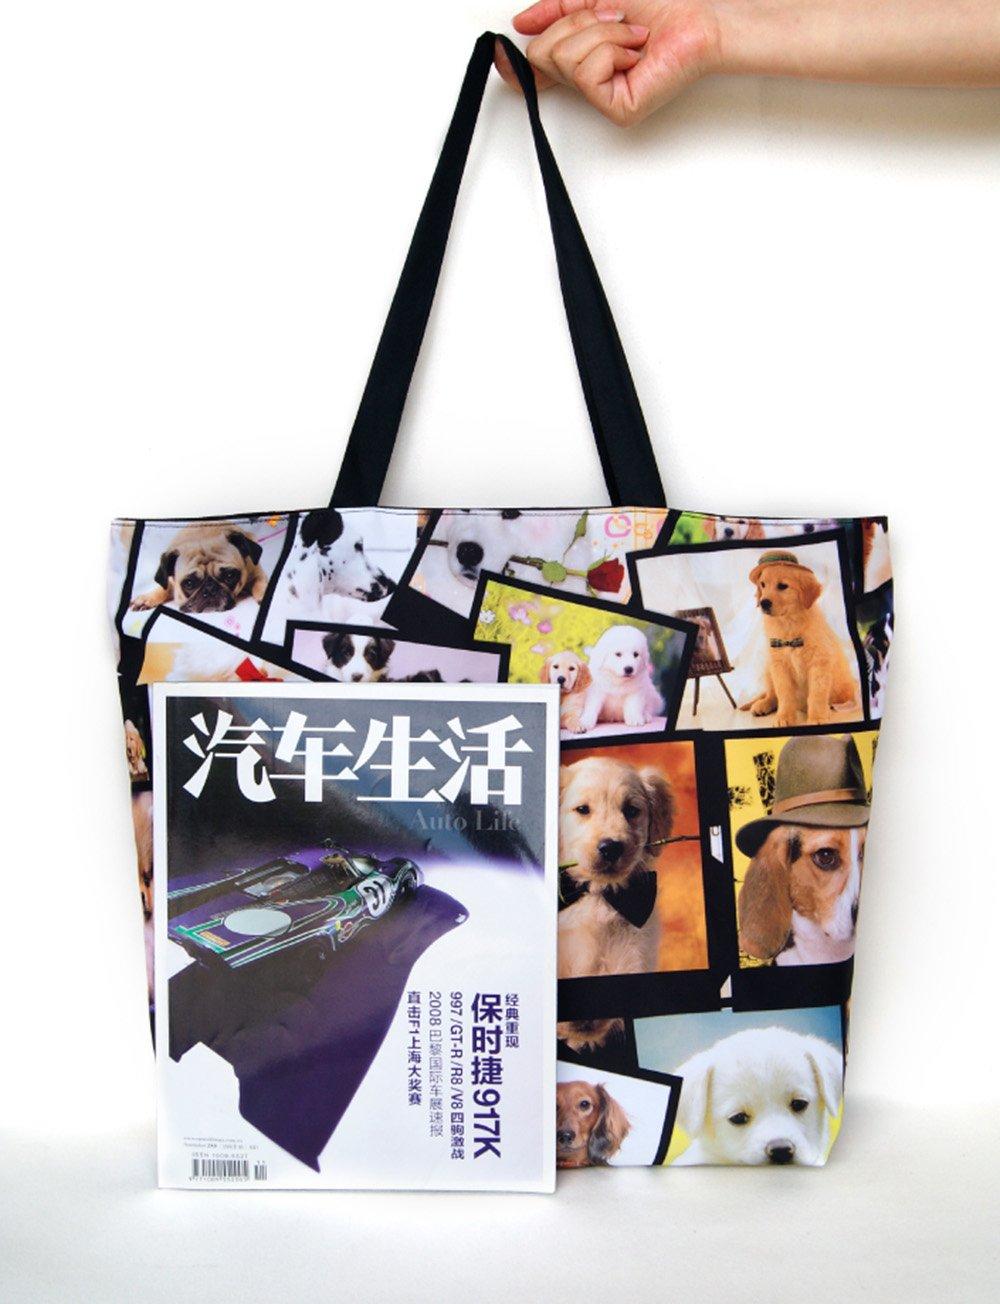 Newplenty Ladies Zippered Light Shoulder Shopping Tote Bag Handbag Beach Satchel, Many Dogs by newplenty (Image #7)